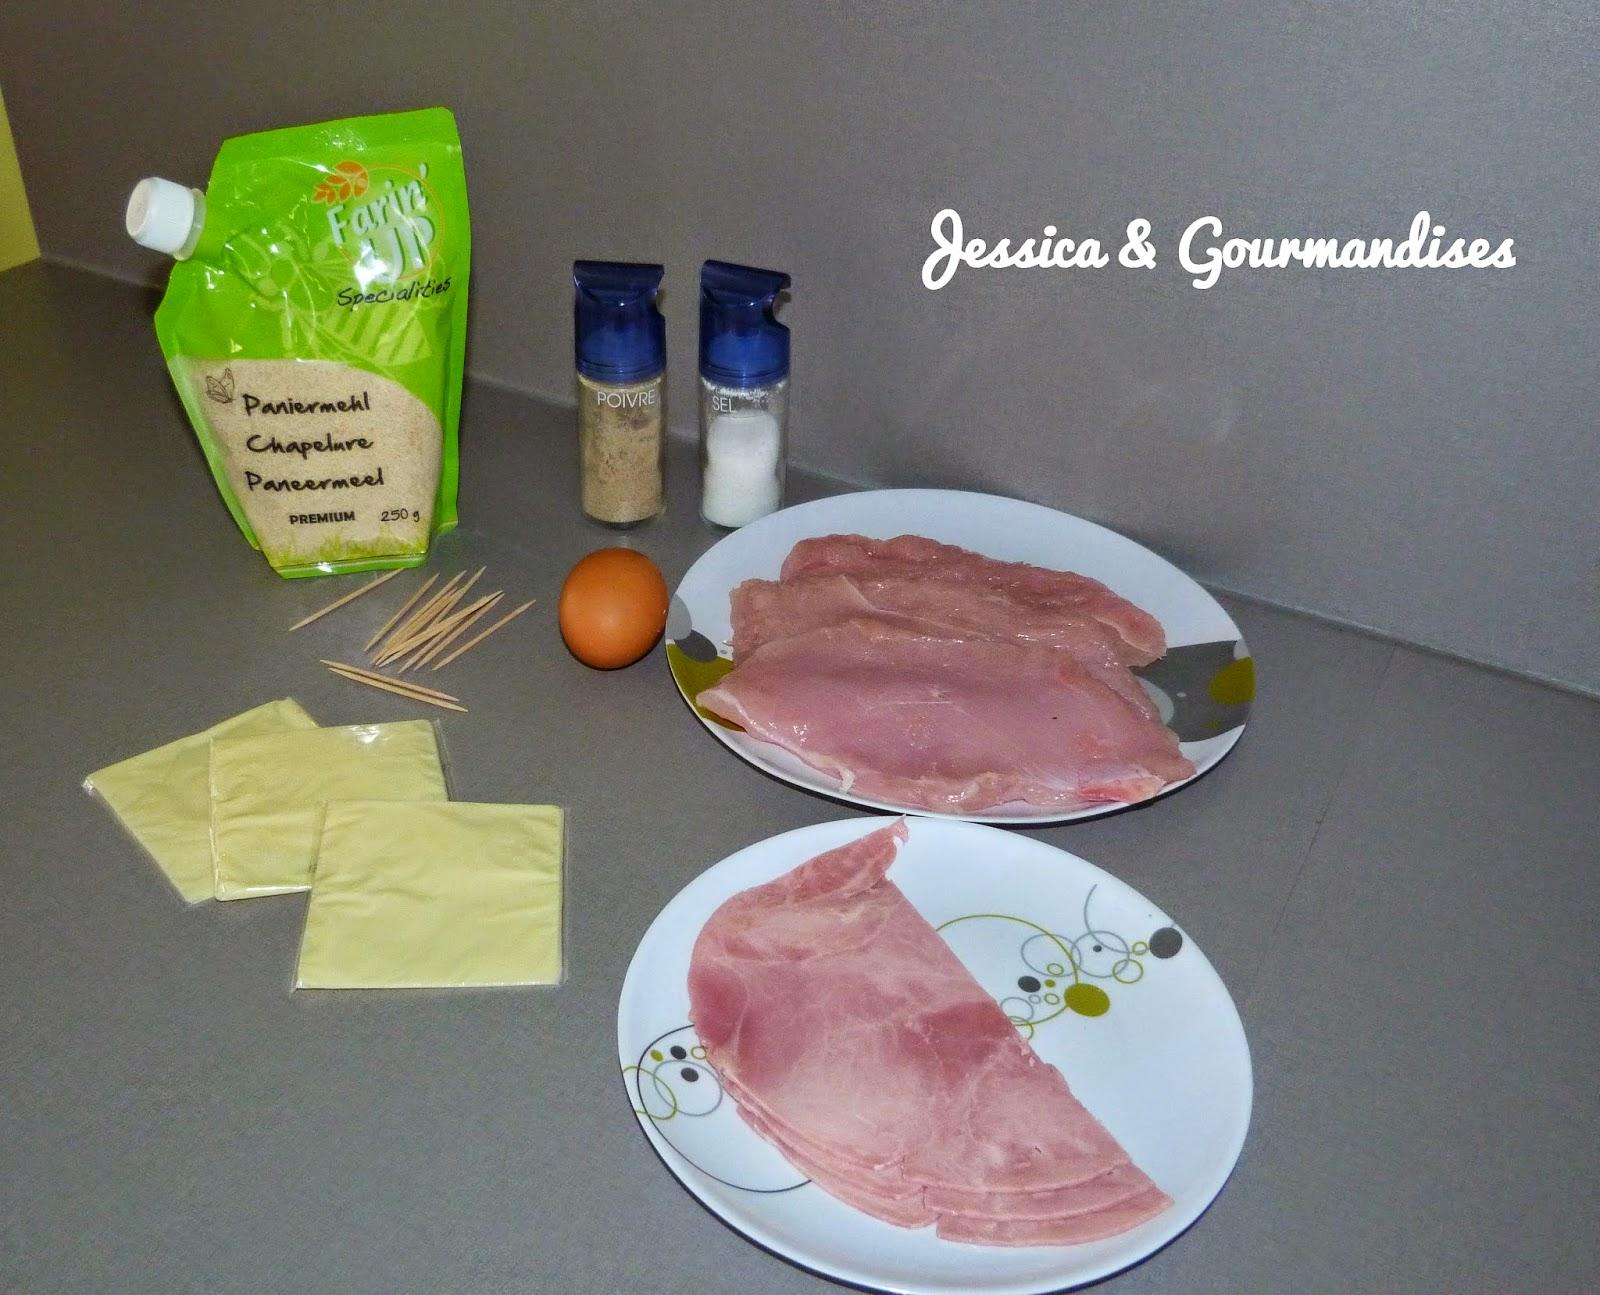 Jessica gourmandises cordon bleu maison - Escalope cordon bleu maison ...